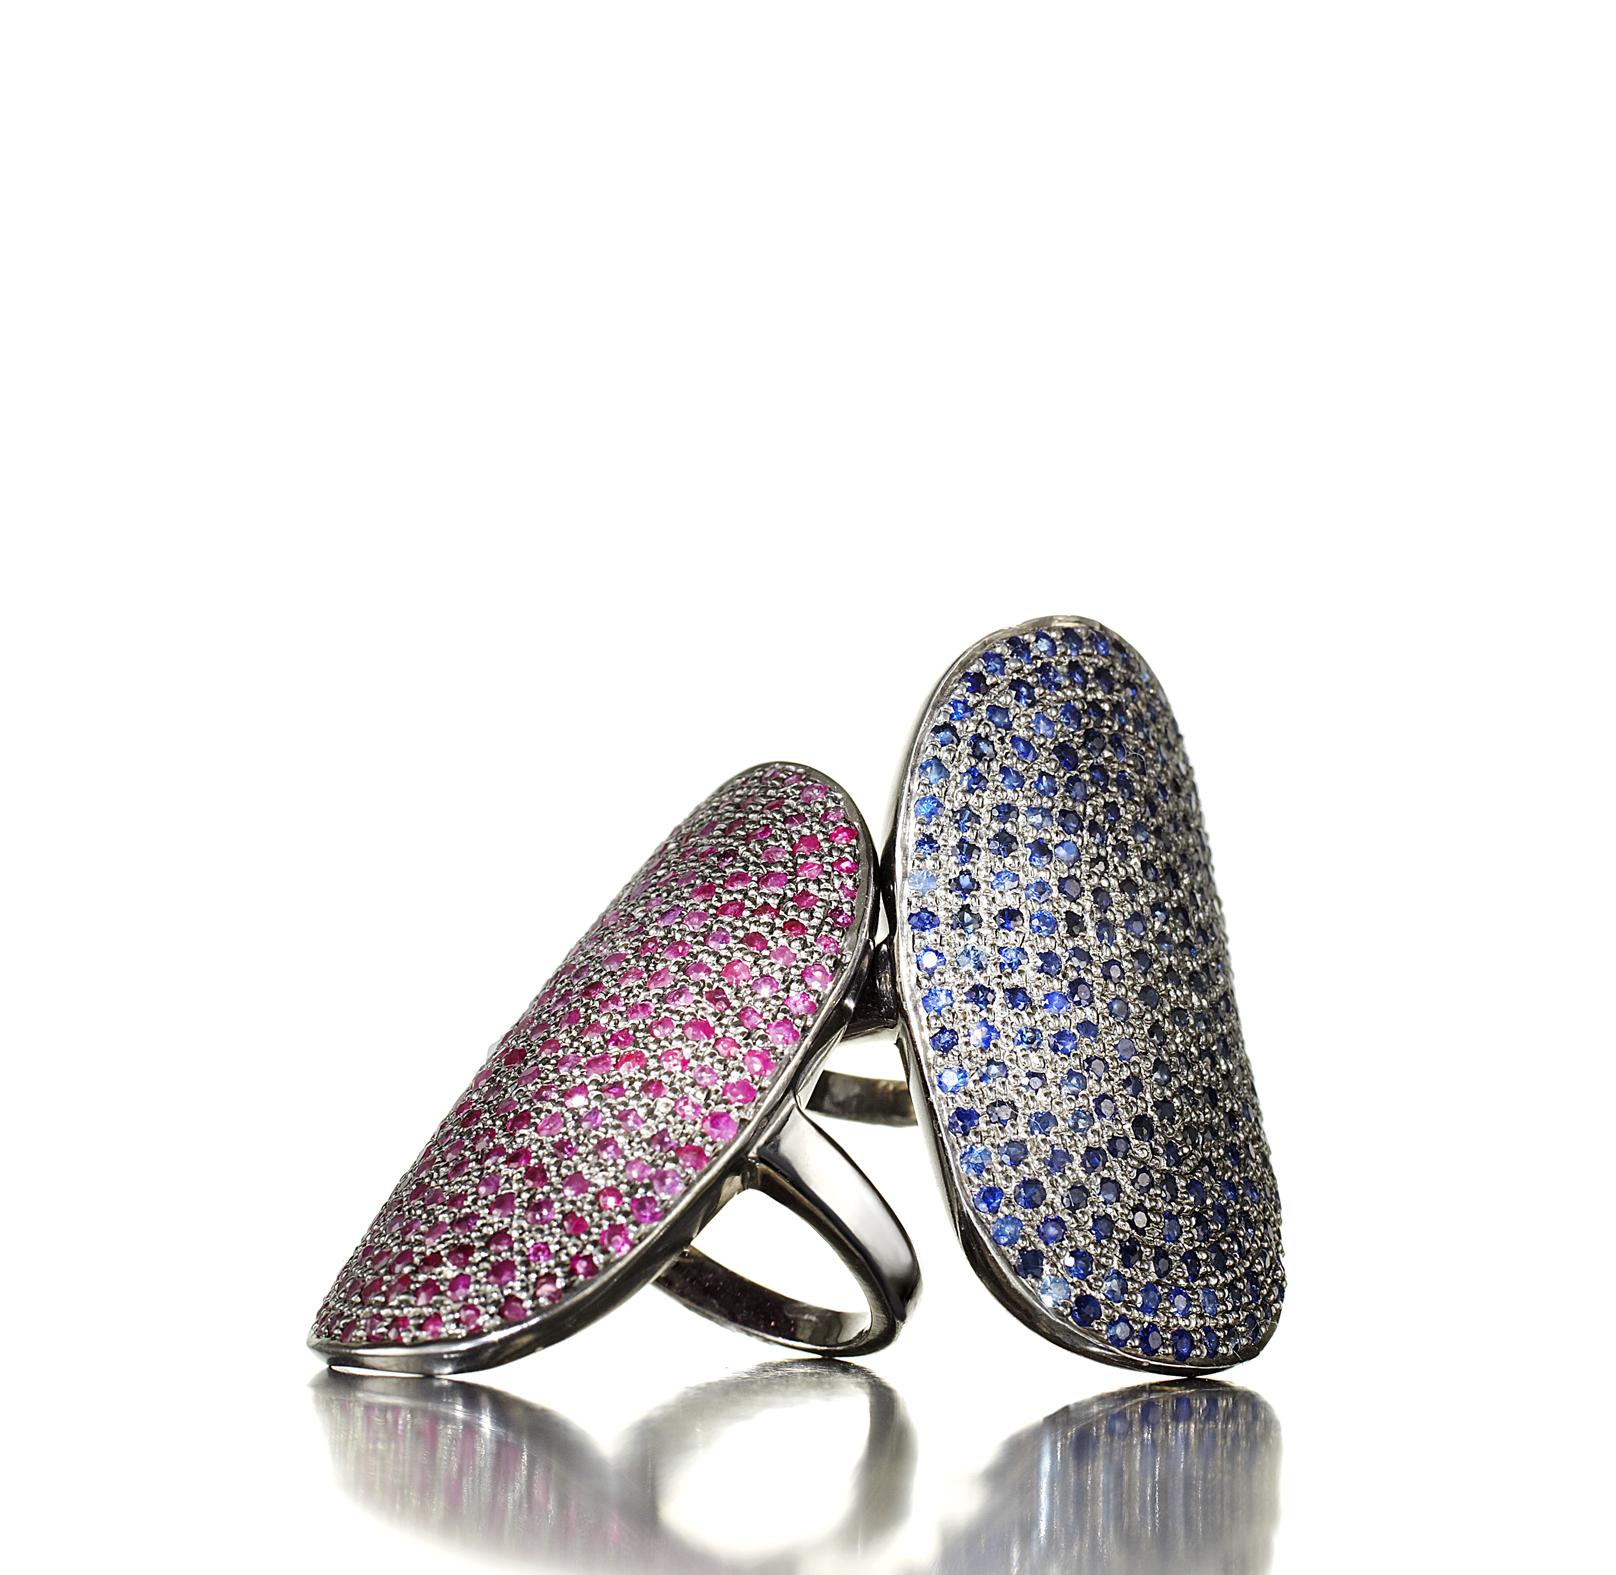 C Black Diamond Ring17567.jpg